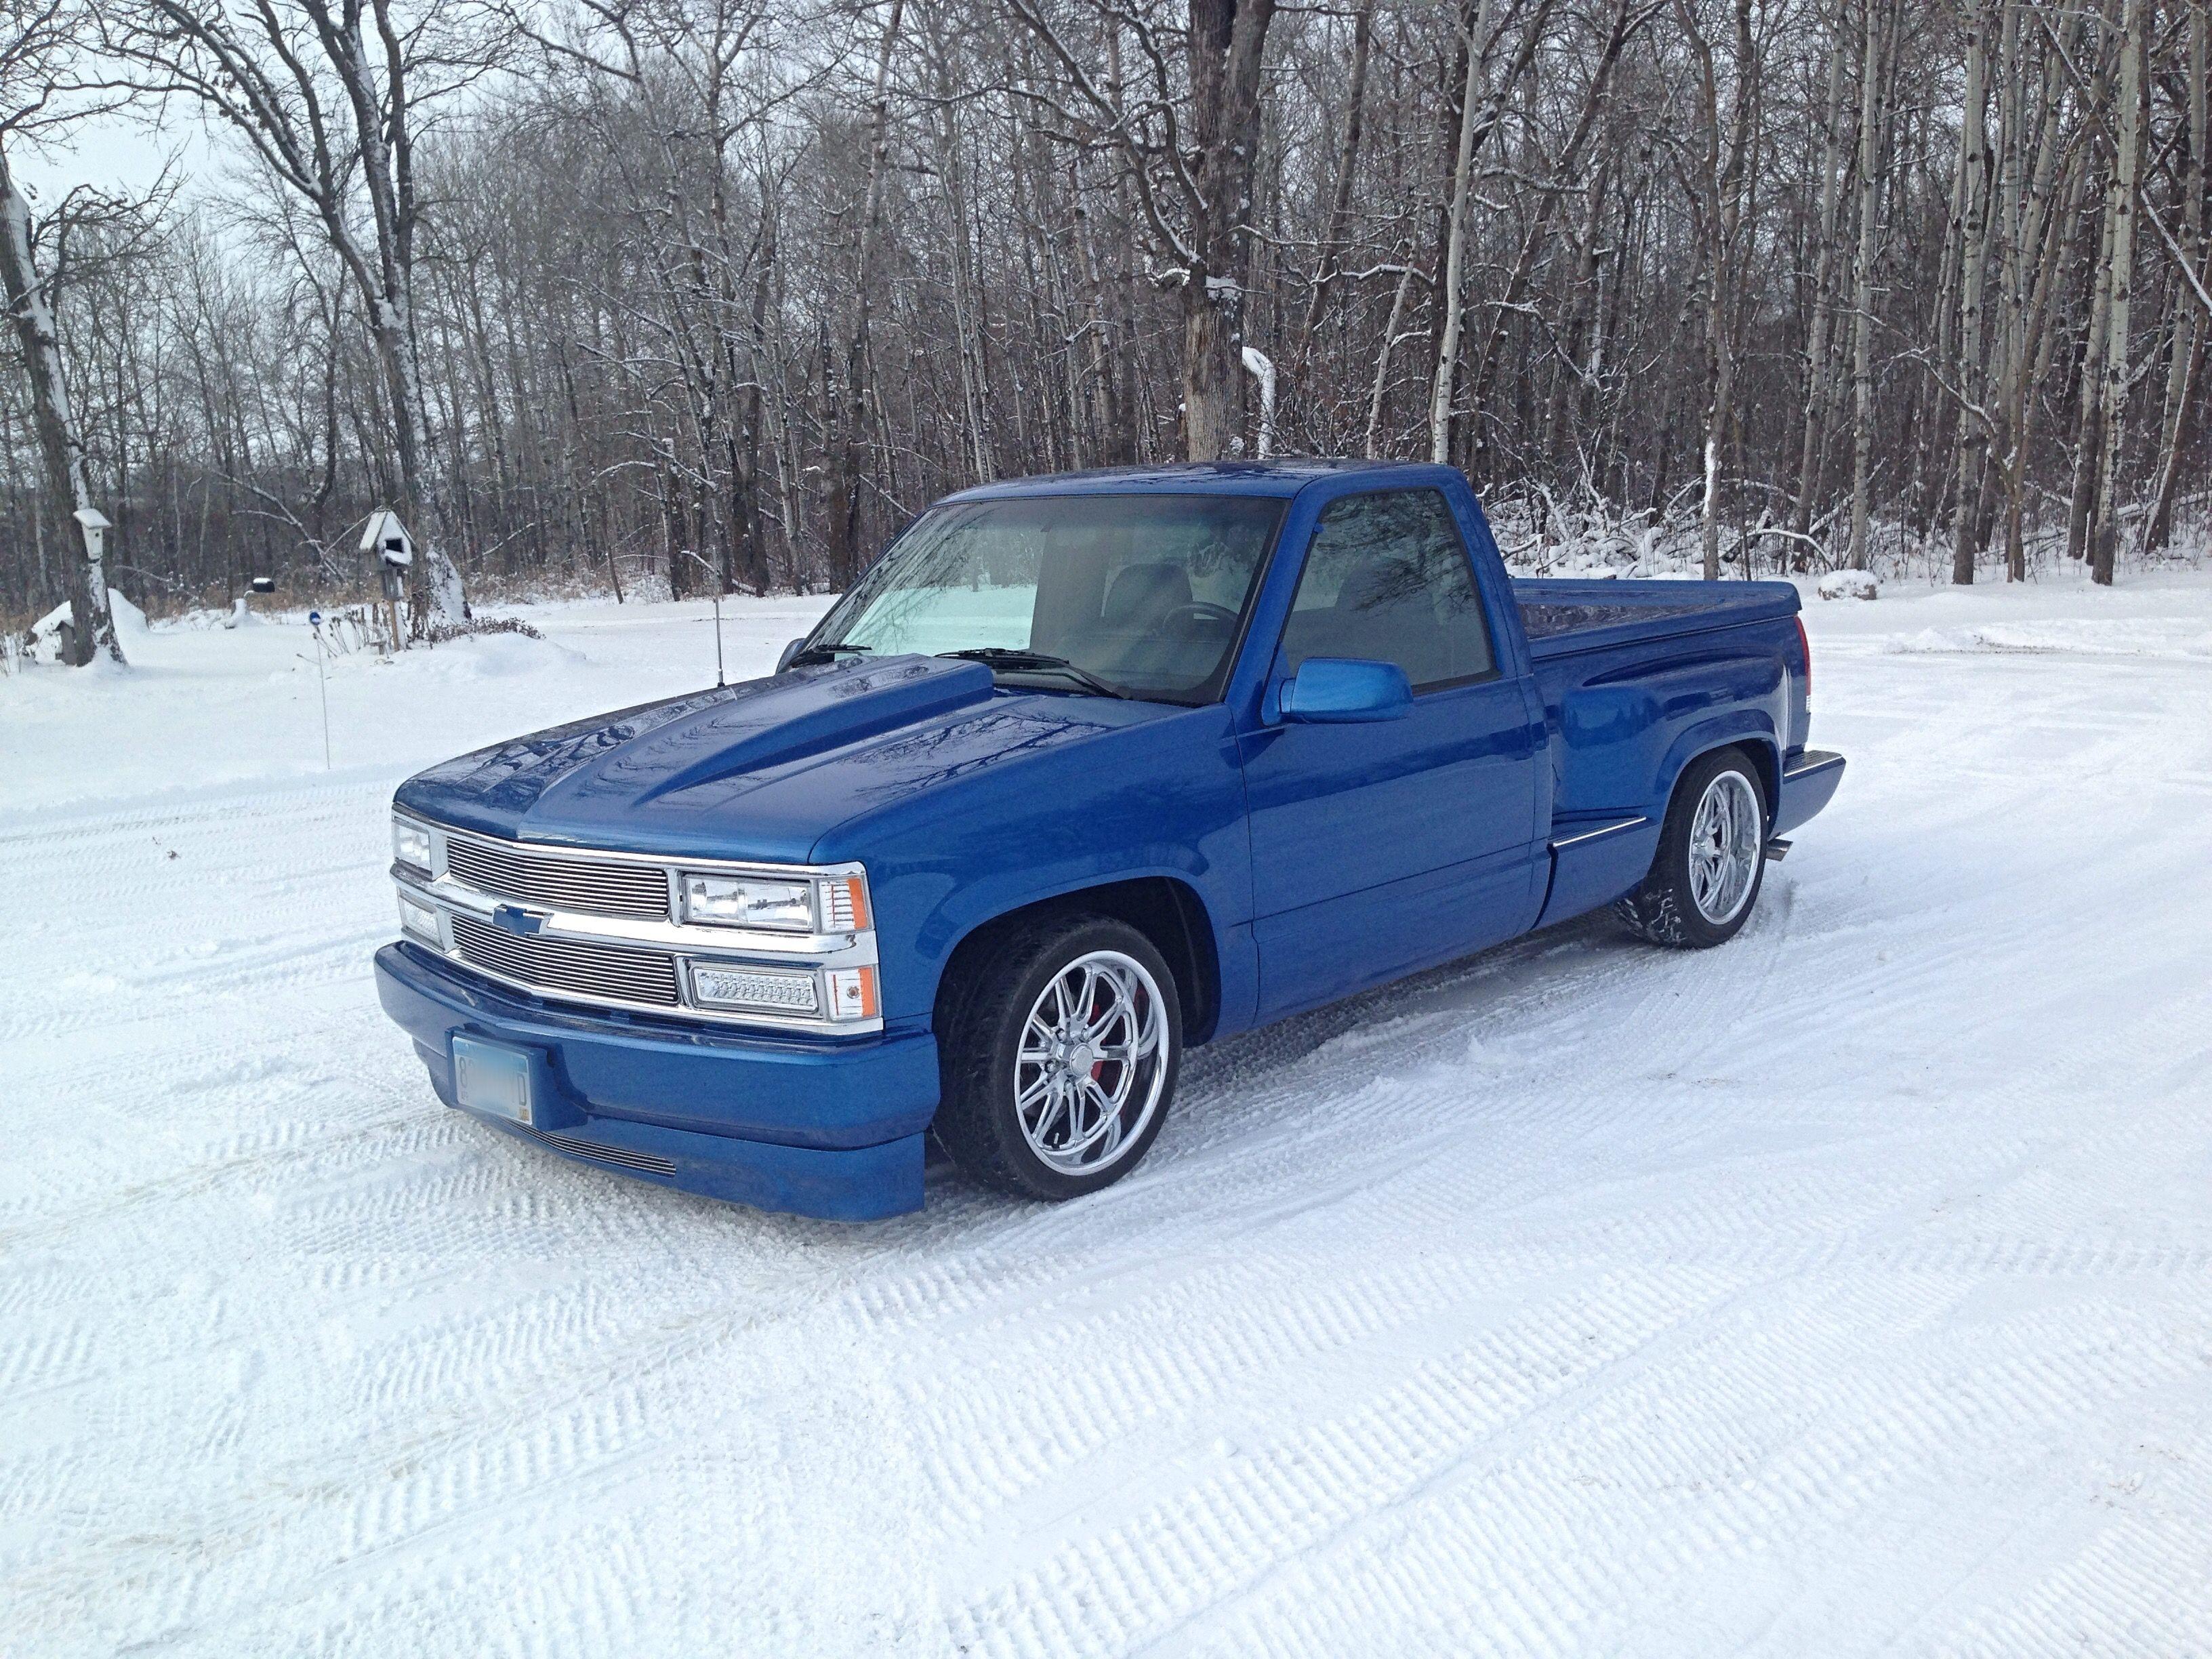 medium resolution of 1992 chevrolet stepside chevy stepside chevy silverado 1500 chevy pickups hot rod trucks